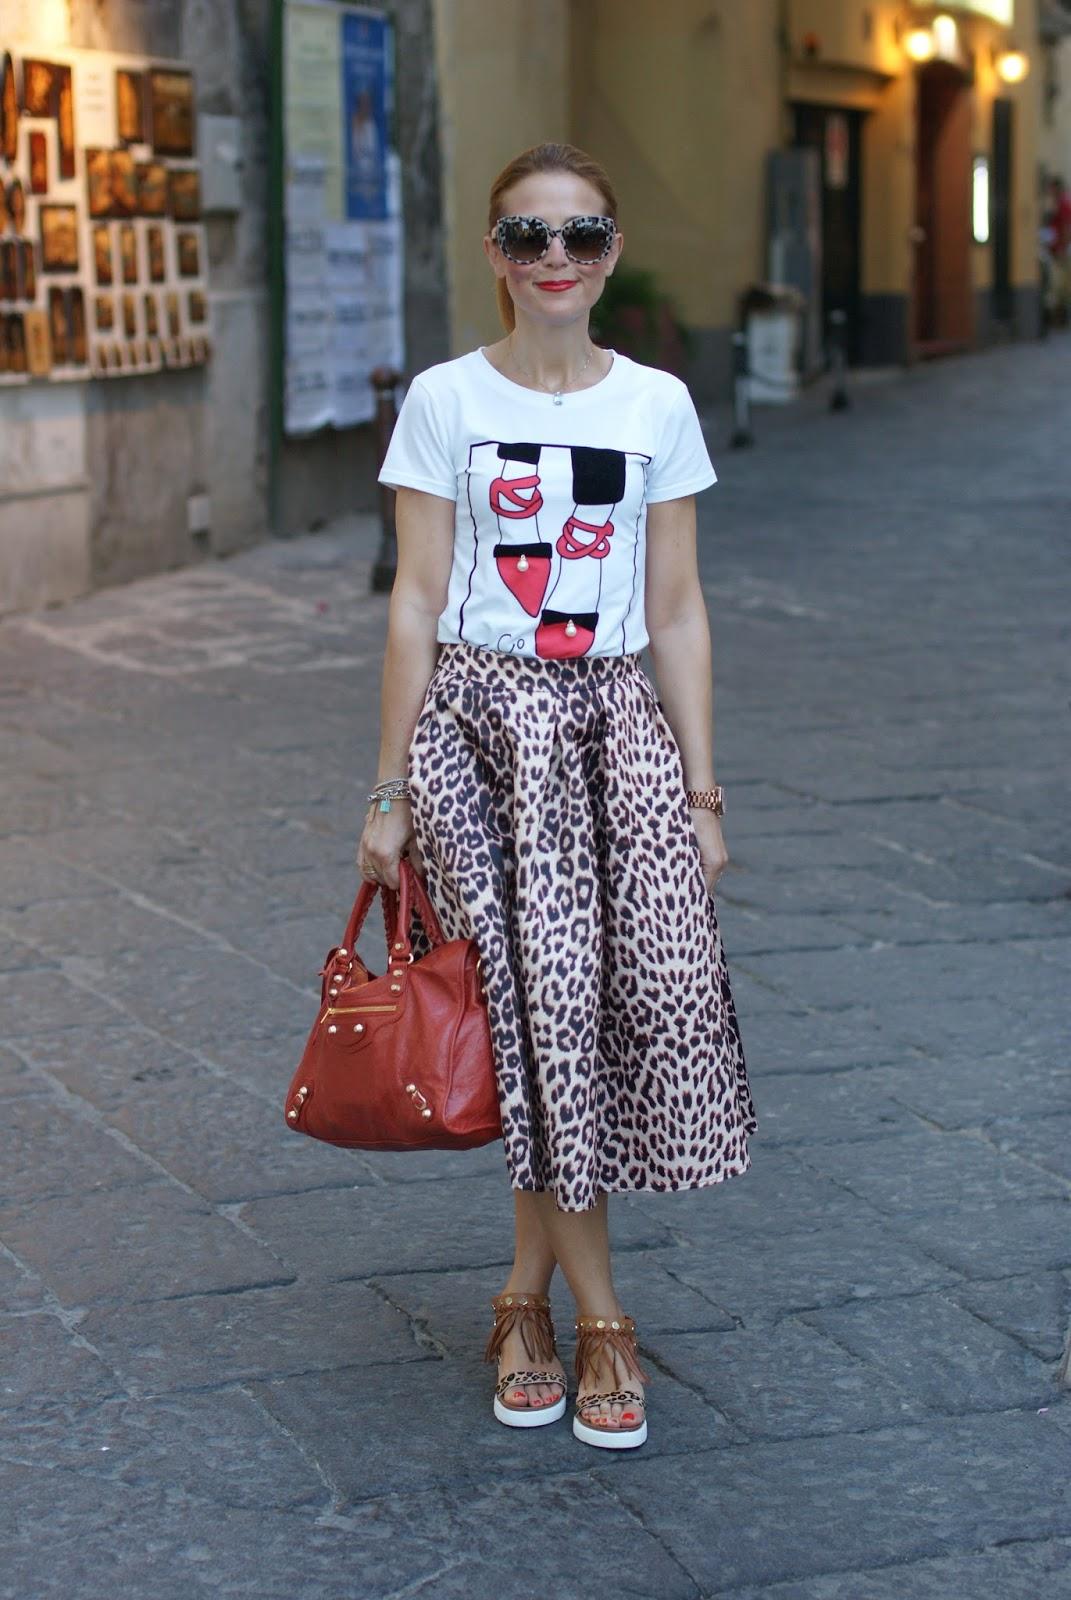 Leopard bon ton with Dolce & Gabbana leopard sunglasses found on Giarre.com, leopard print midi skirt on Fashion and Cookies fashion blog, fashion blogger style